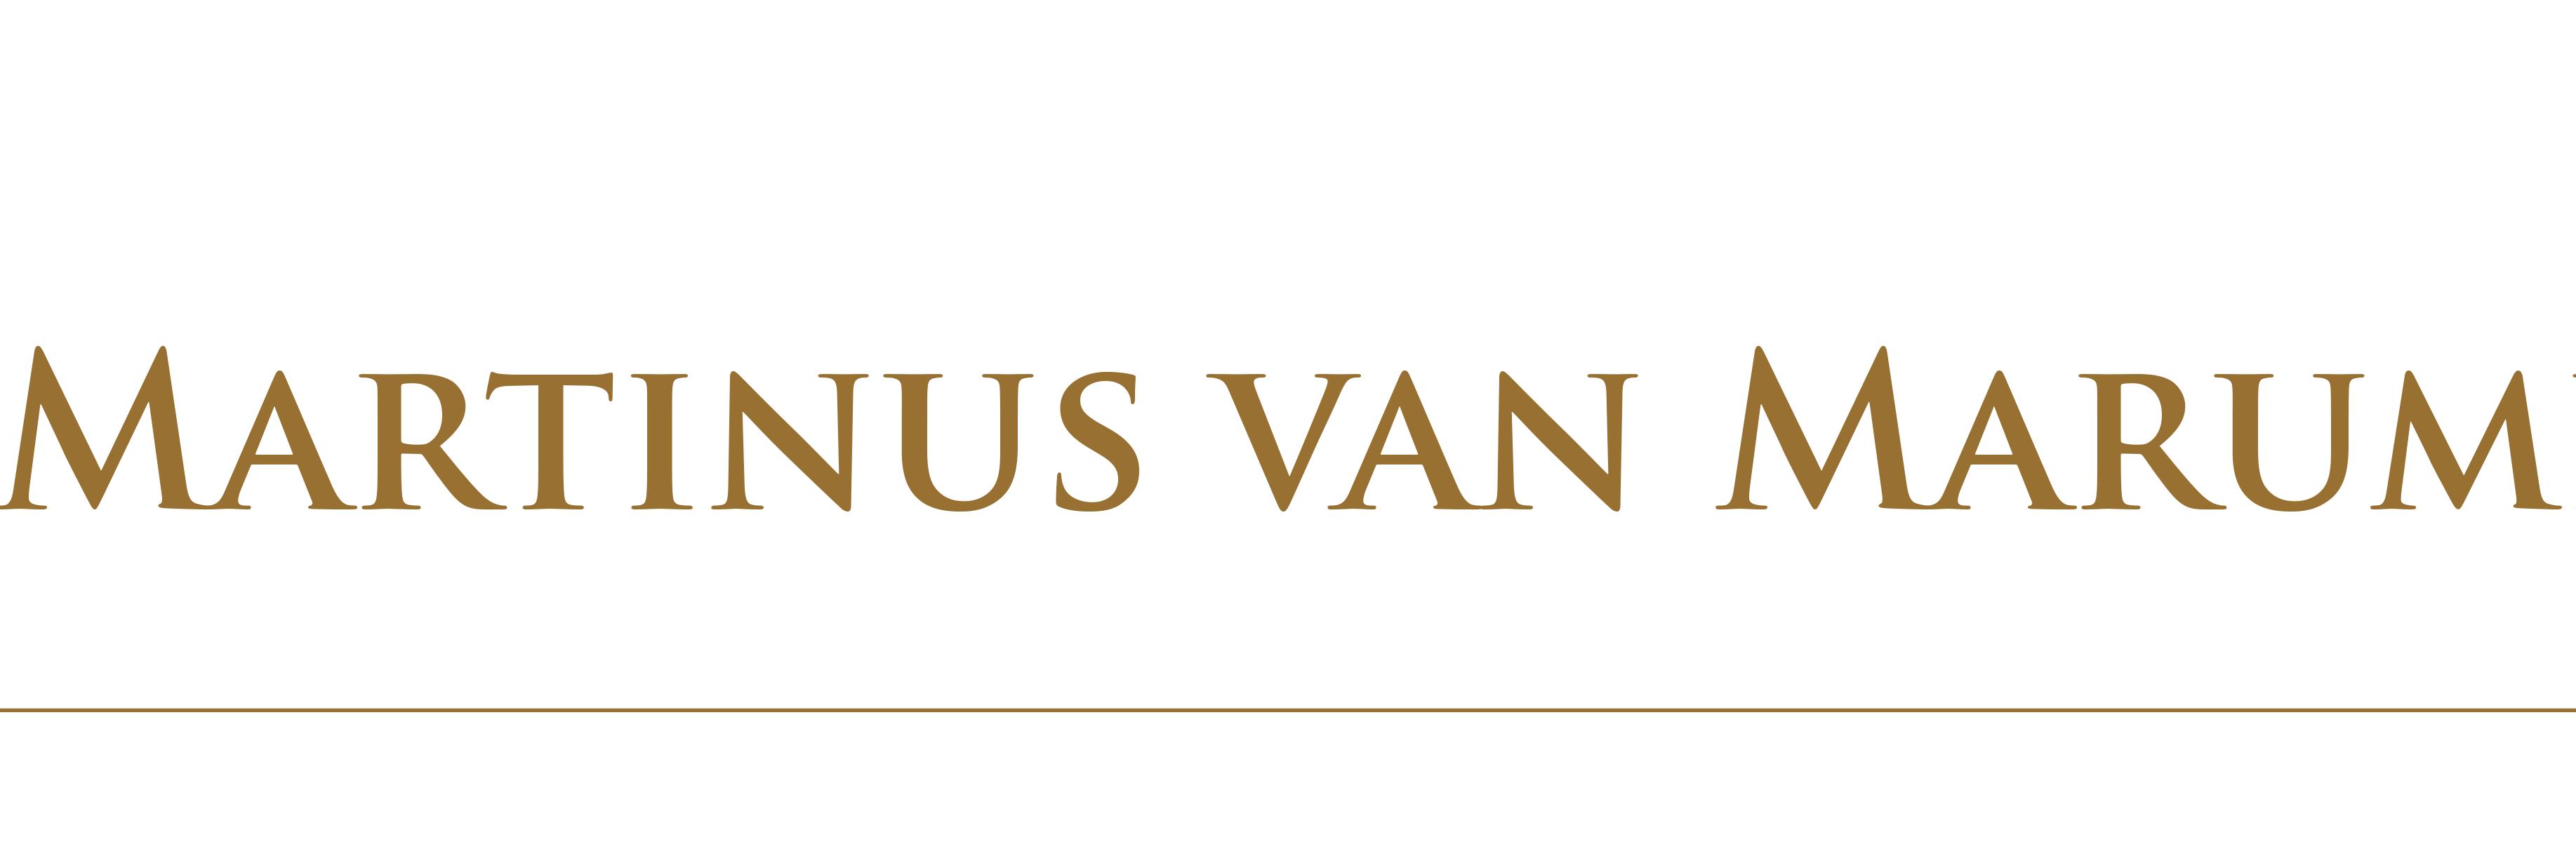 Martinus van Marum Stichting